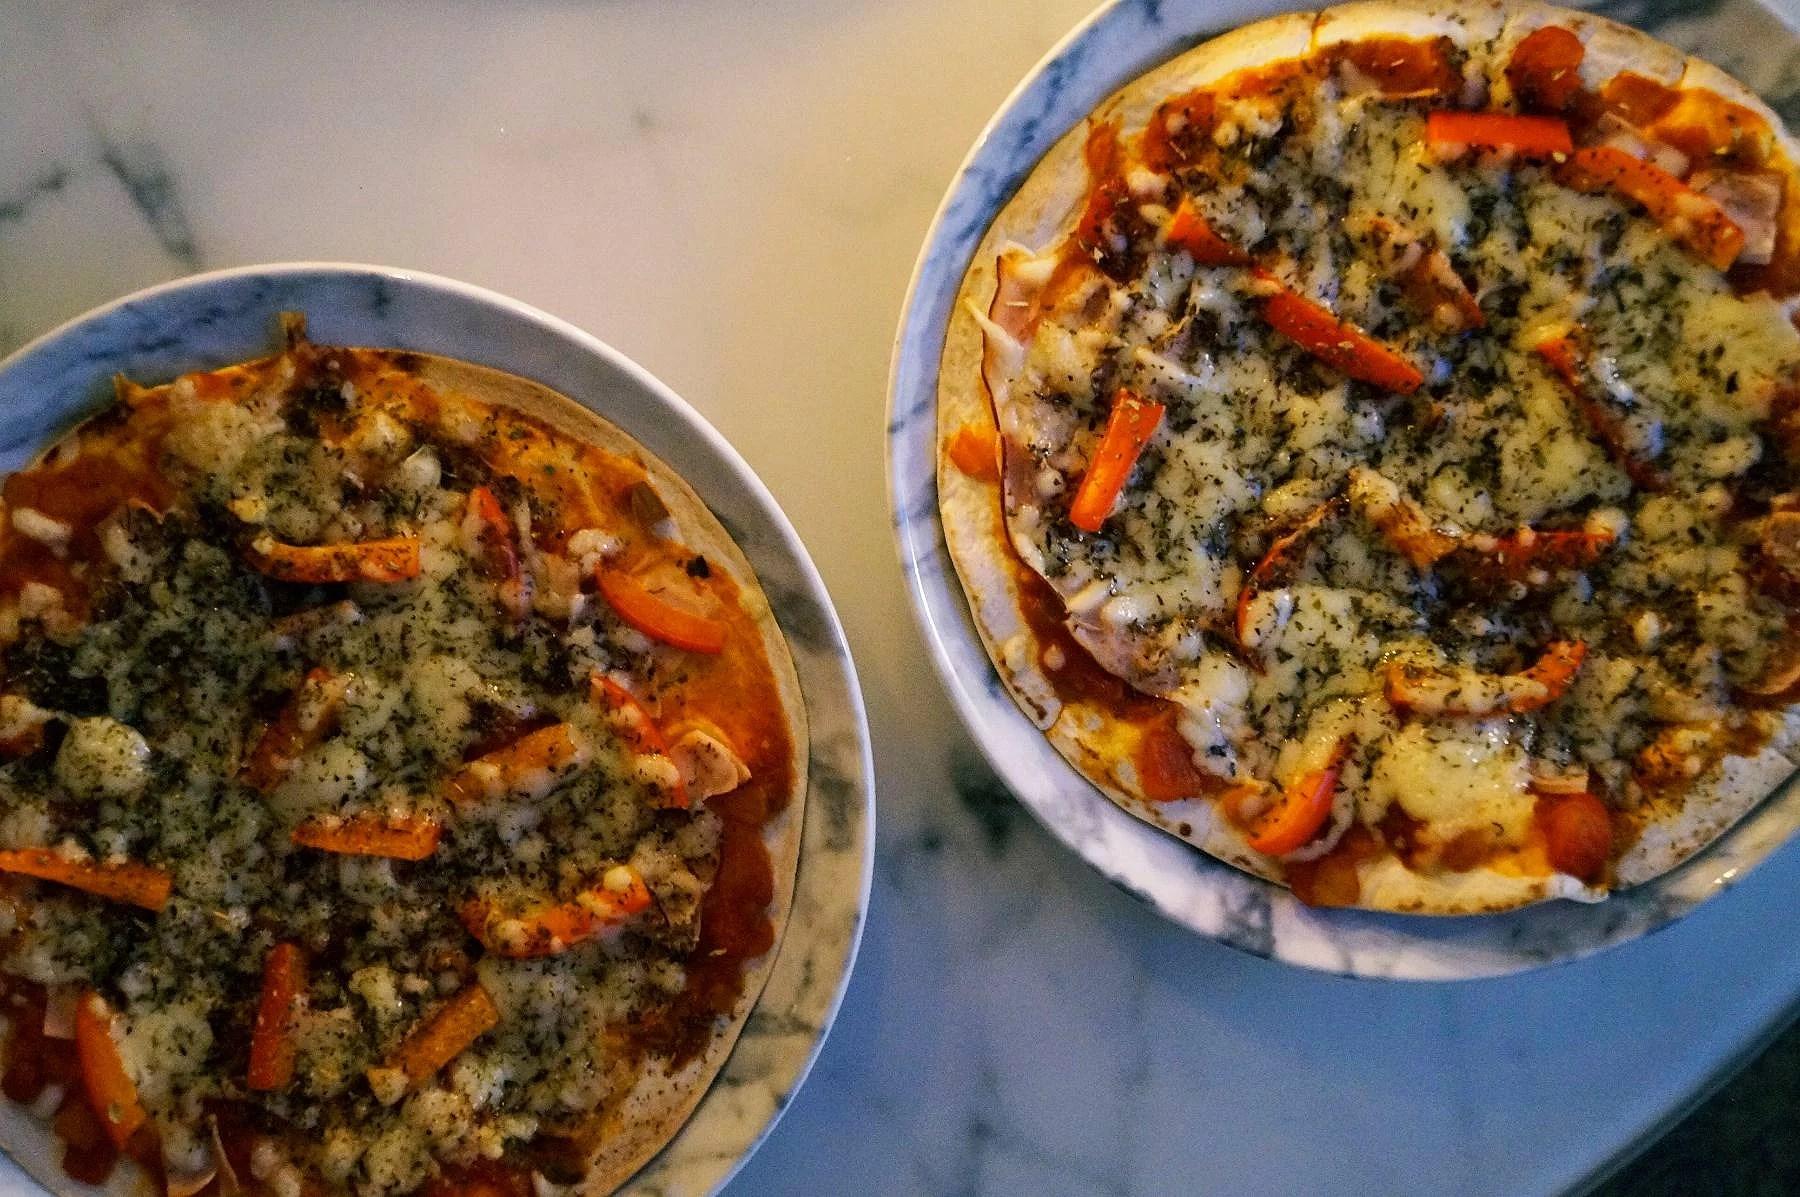 Just nu: Pizza på tacobröd